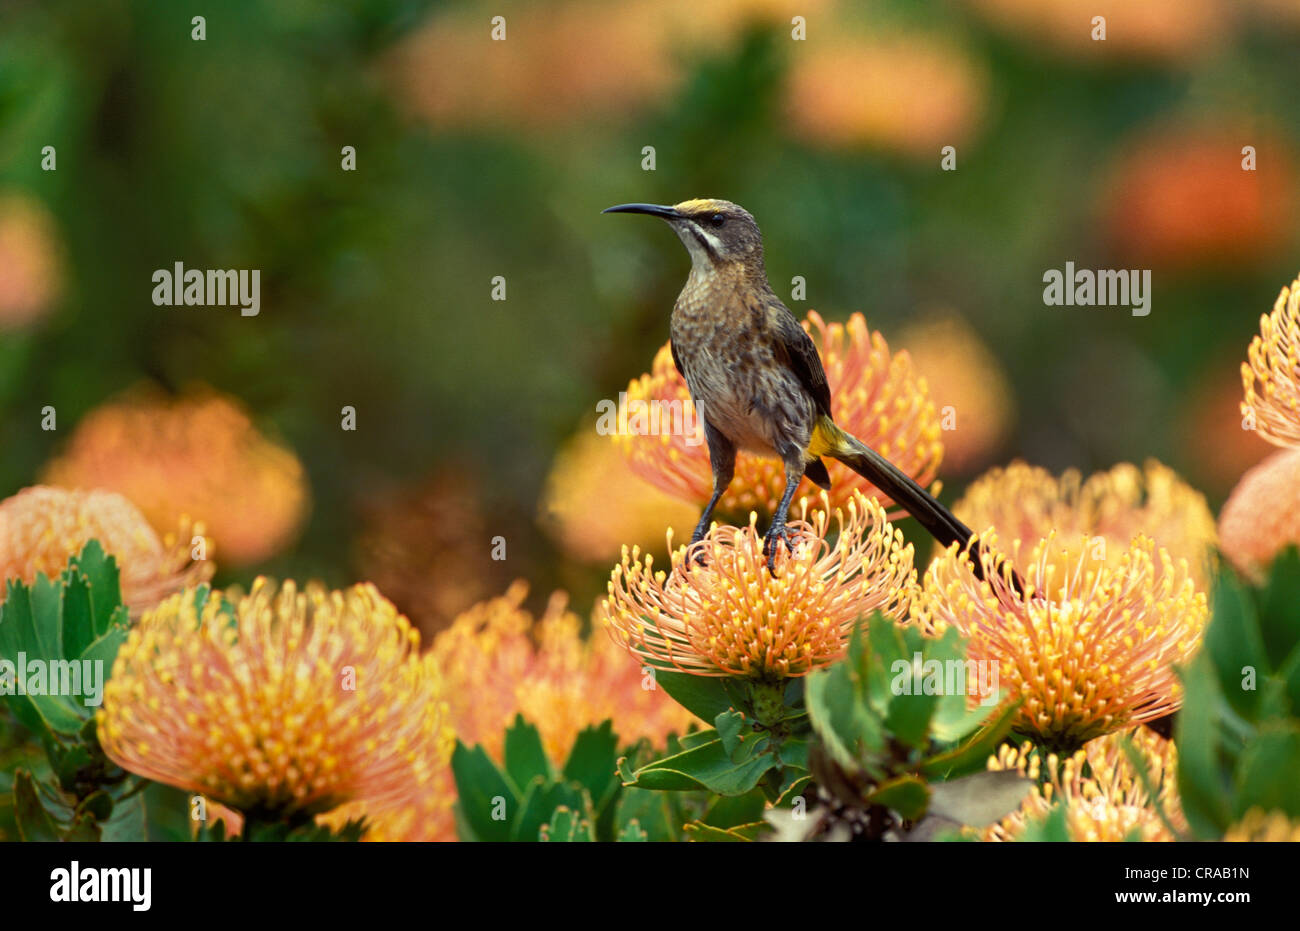 Cape Sugarbird (Promerops caffer), on Pincushion Protea, Helderberg Nature Reserve, Cape South Africa - Stock Image